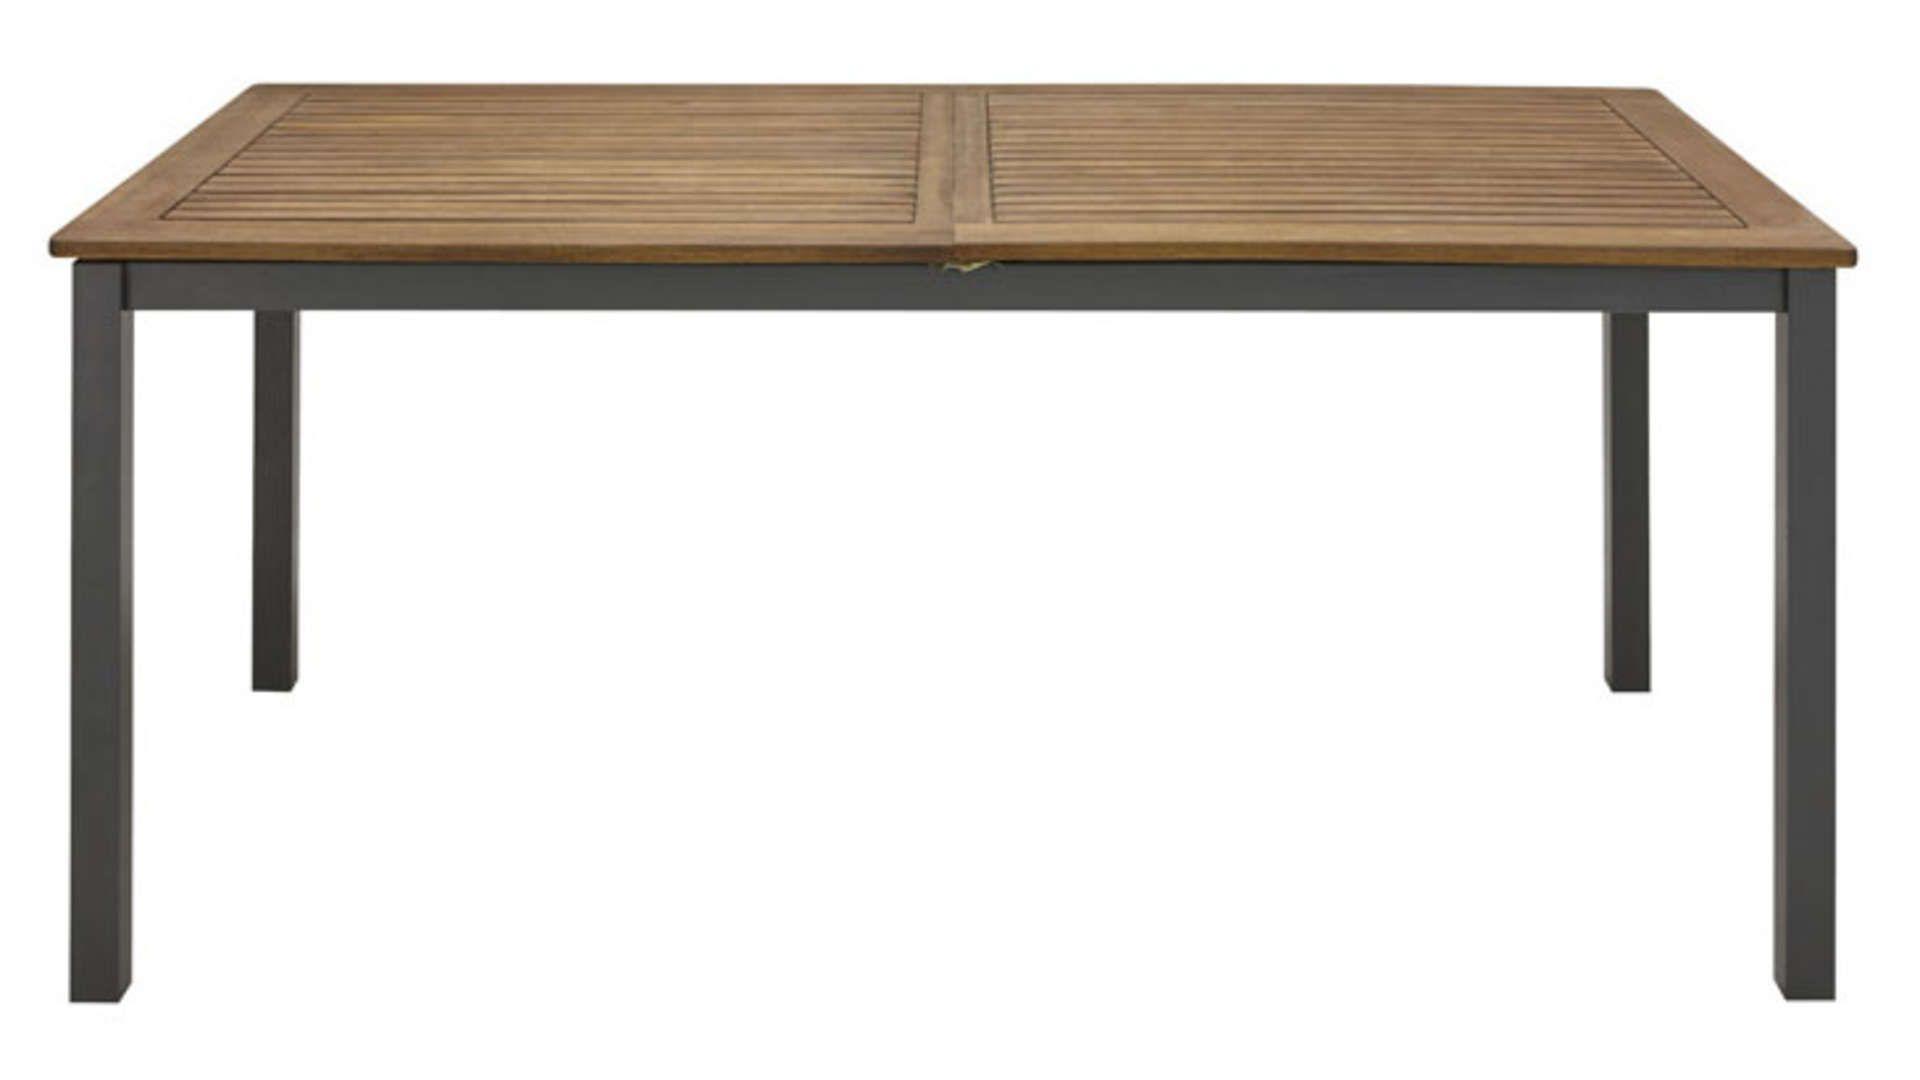 Table Lisbone | Table Extensible, Table, Table De Jardin dedans Table De Jardin Conforama